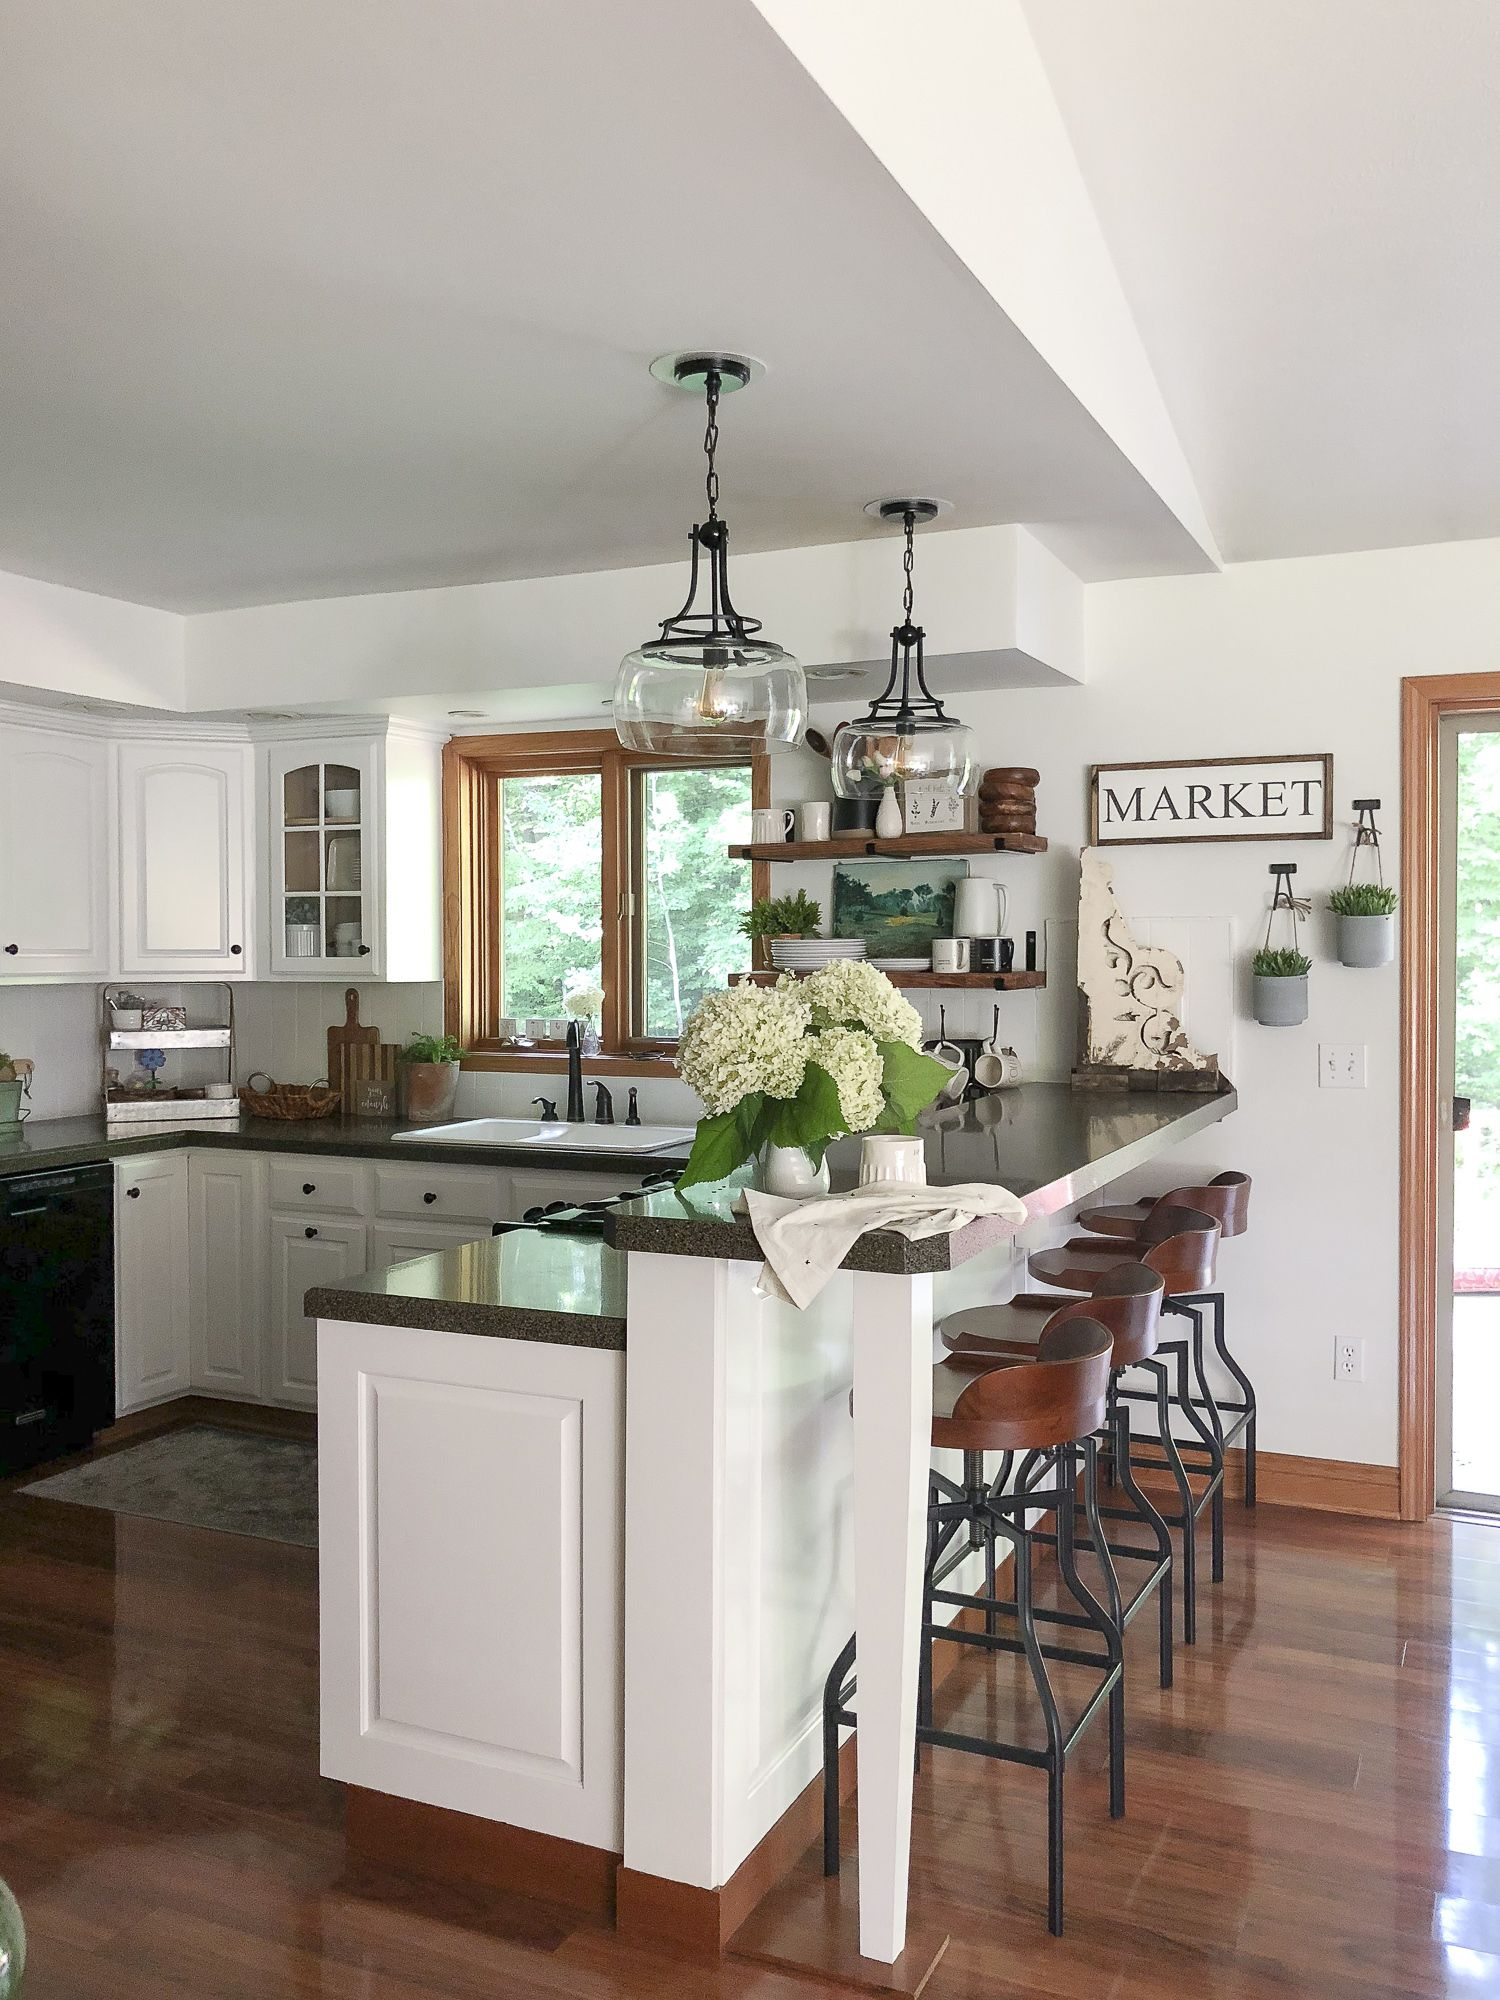 Kitchen Remodel on a Budget Budget kitchen remodel